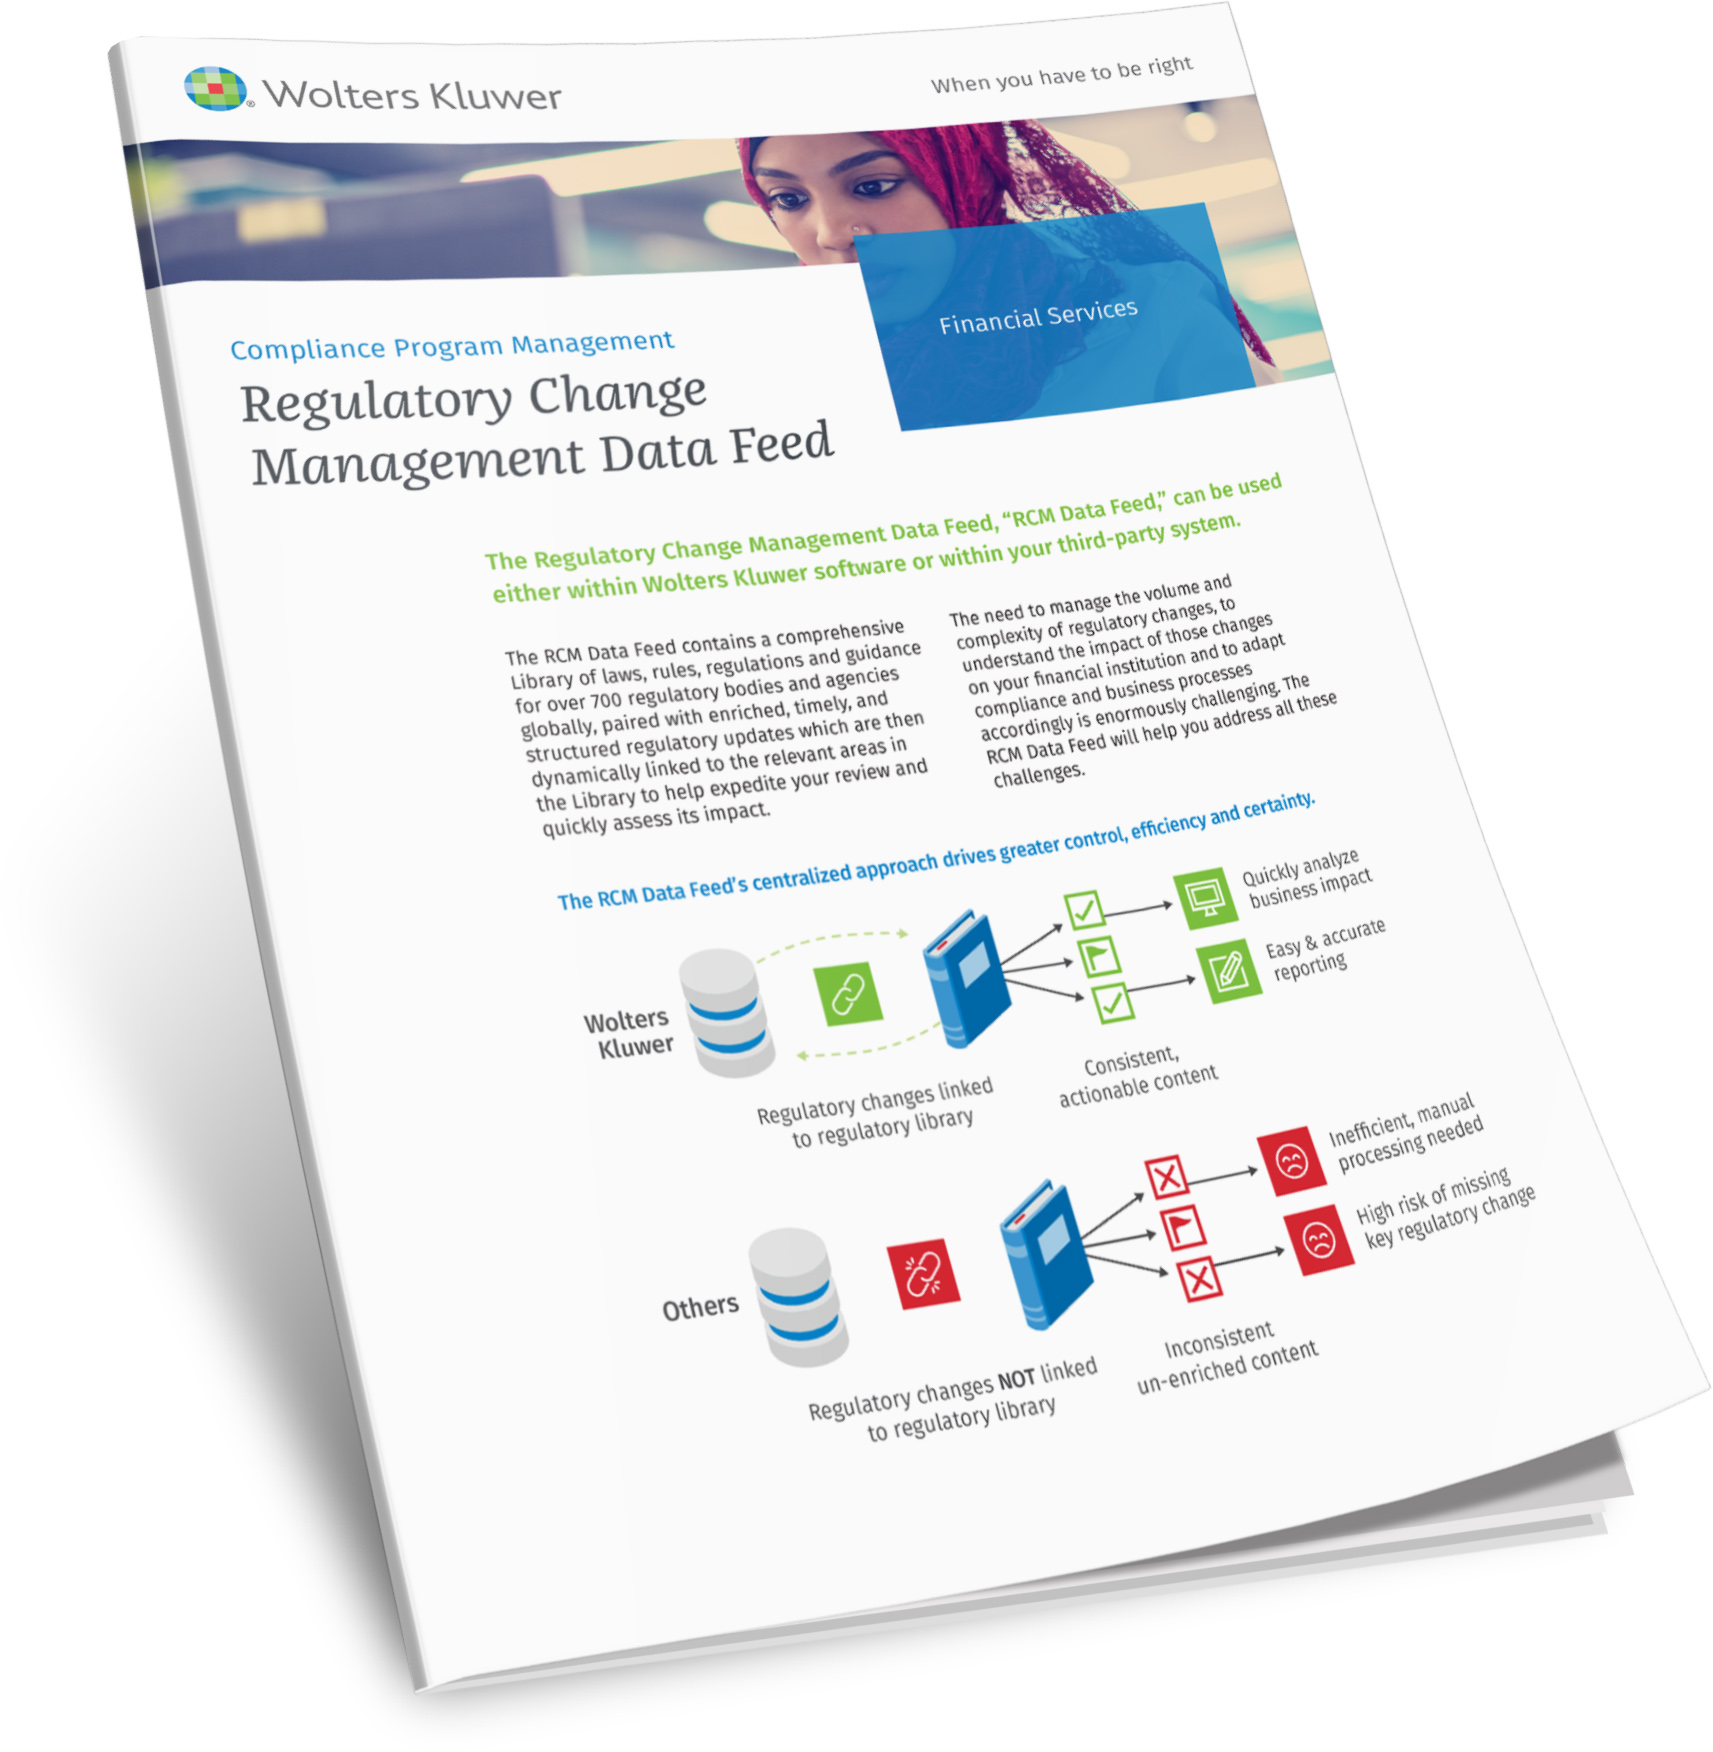 Regulatory Change Management Data Feed